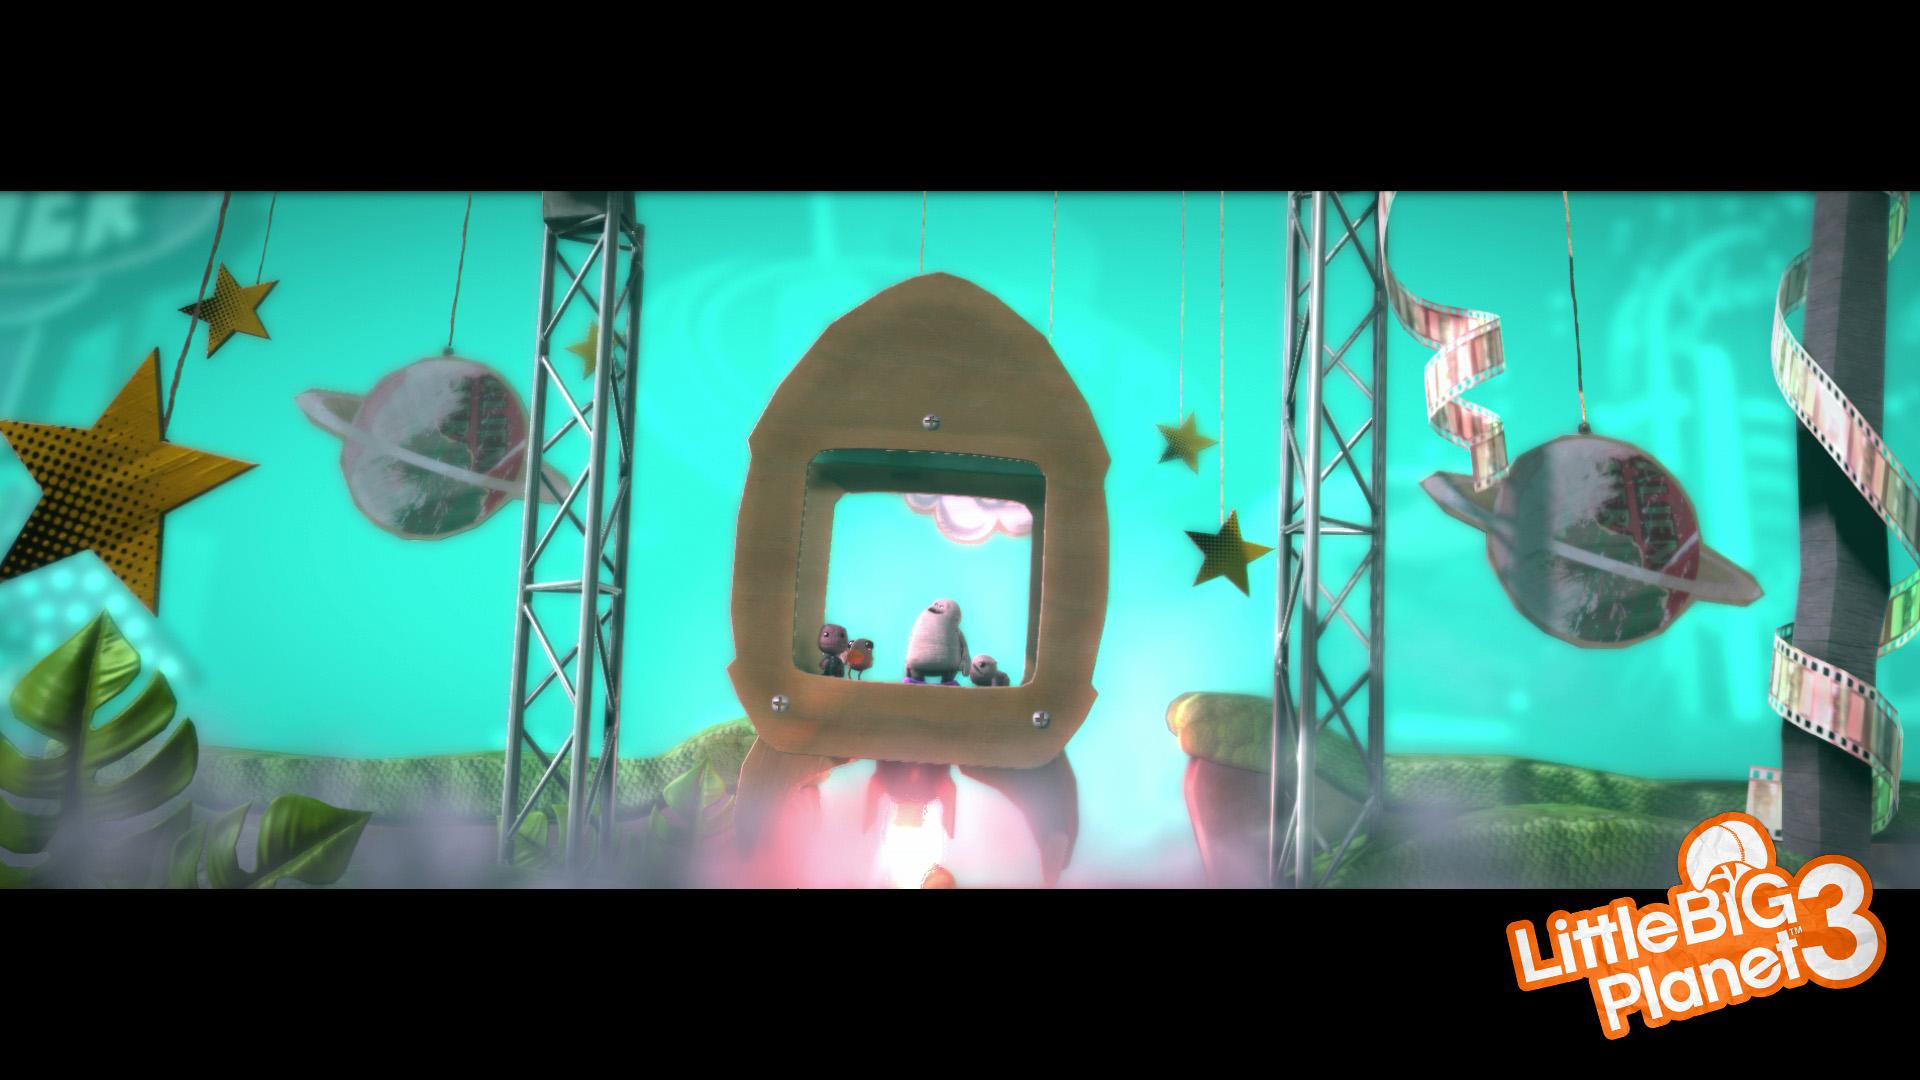 LittleBigPlanet3 PS4 Editeur 017